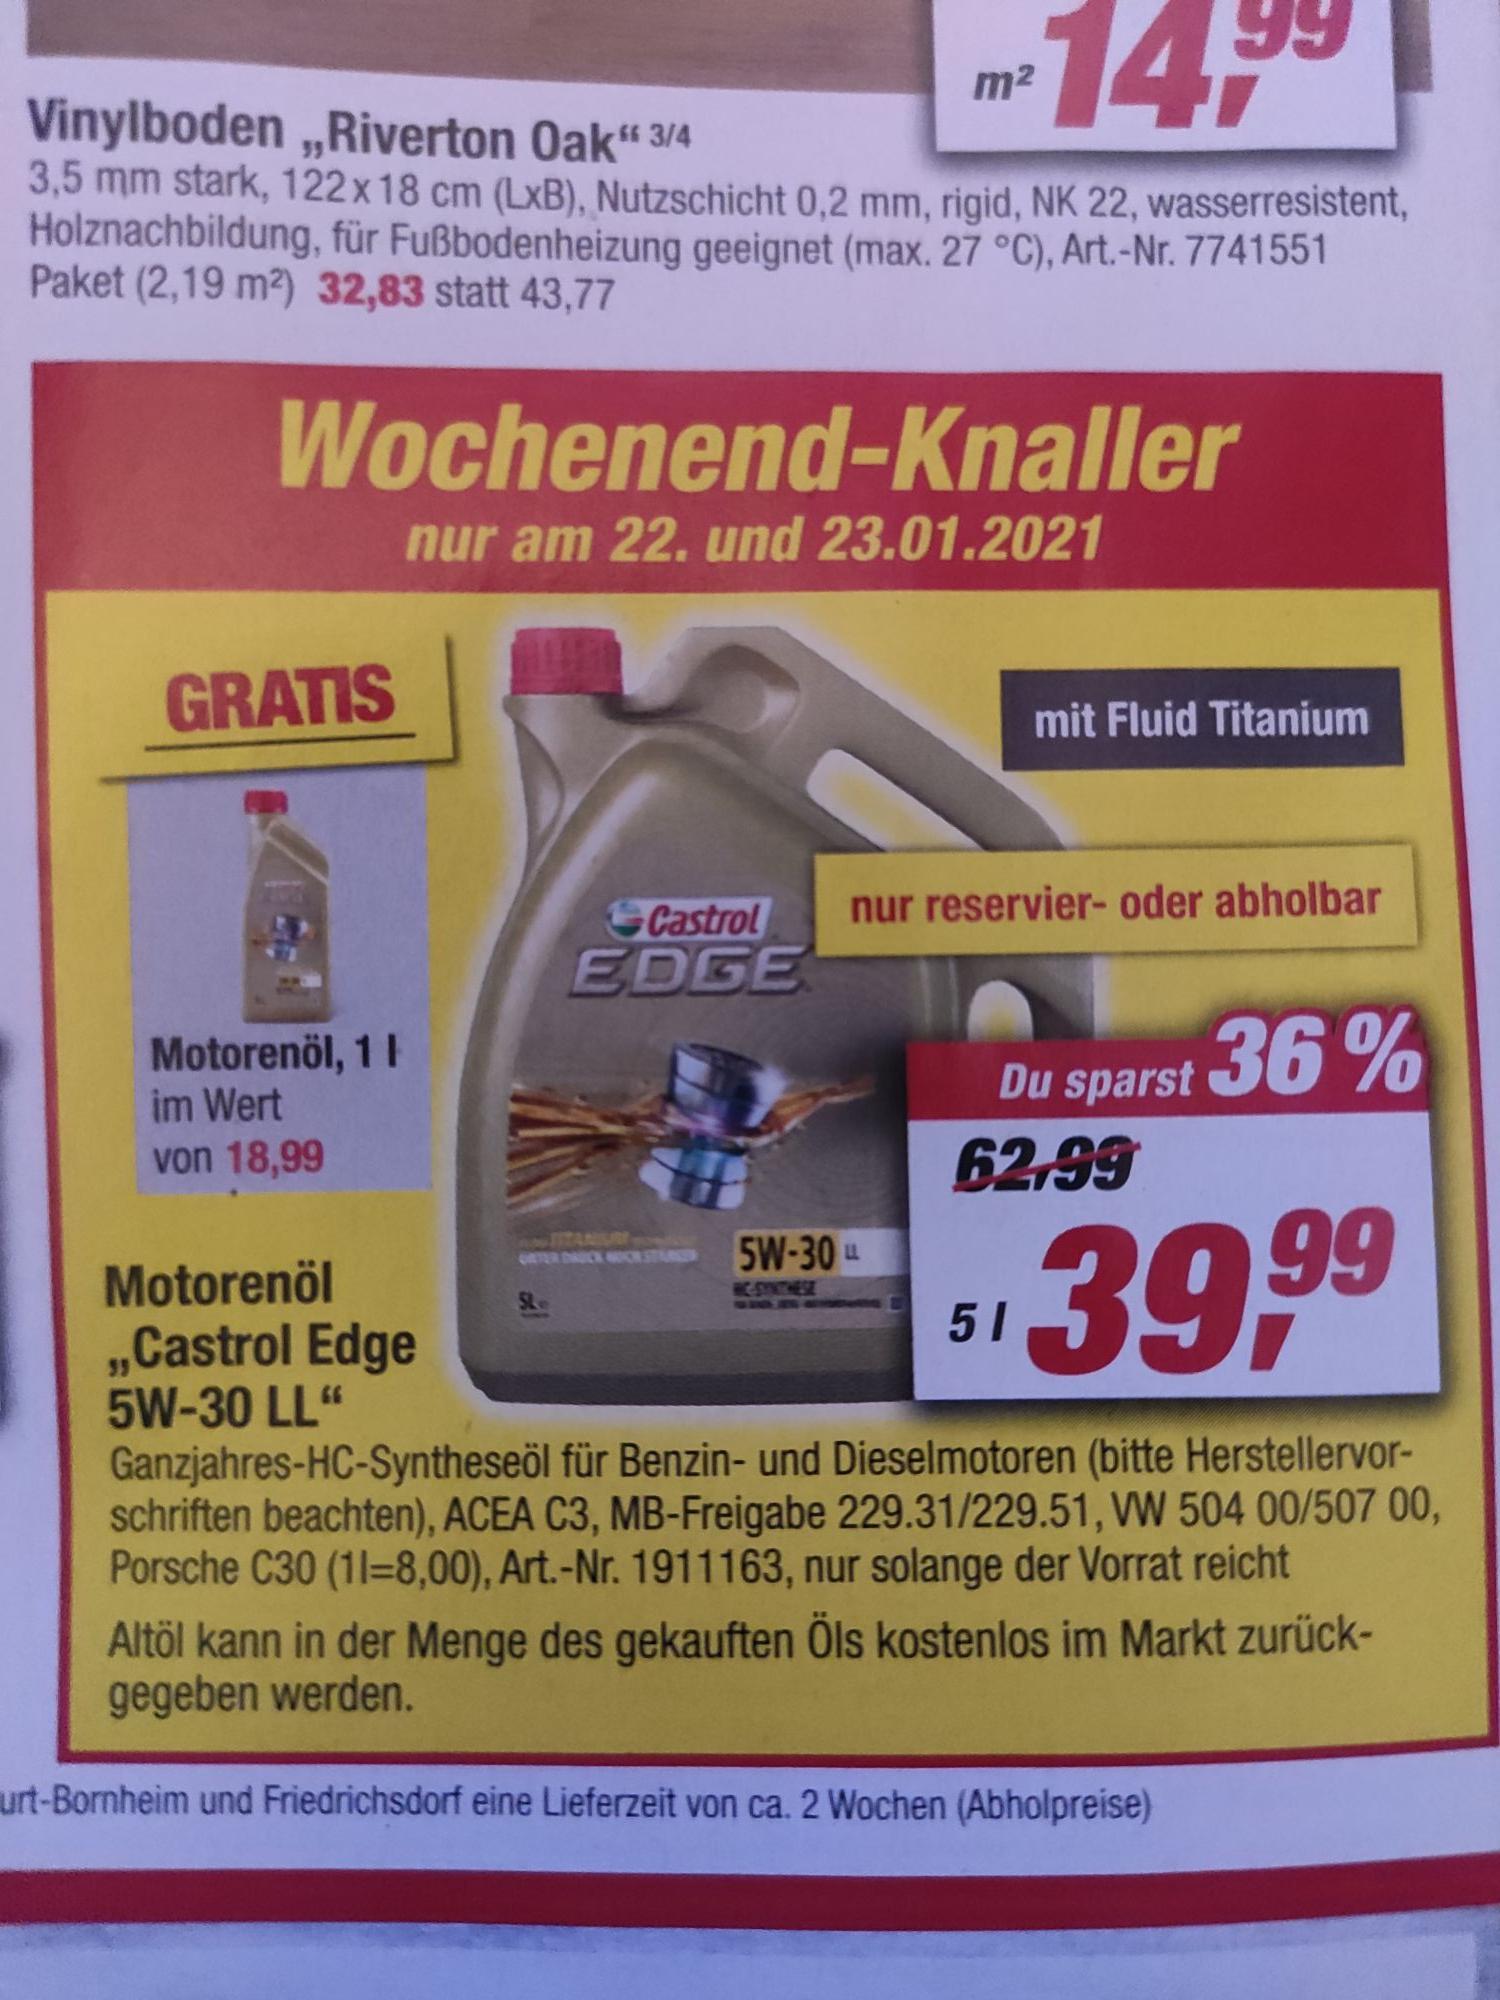 [TOOM] 5+1 Liter Castrol Edge 5w-30 LL (VW, MB, Porsche, ACEA C3) Motoröl (6,66 € pro Liter)